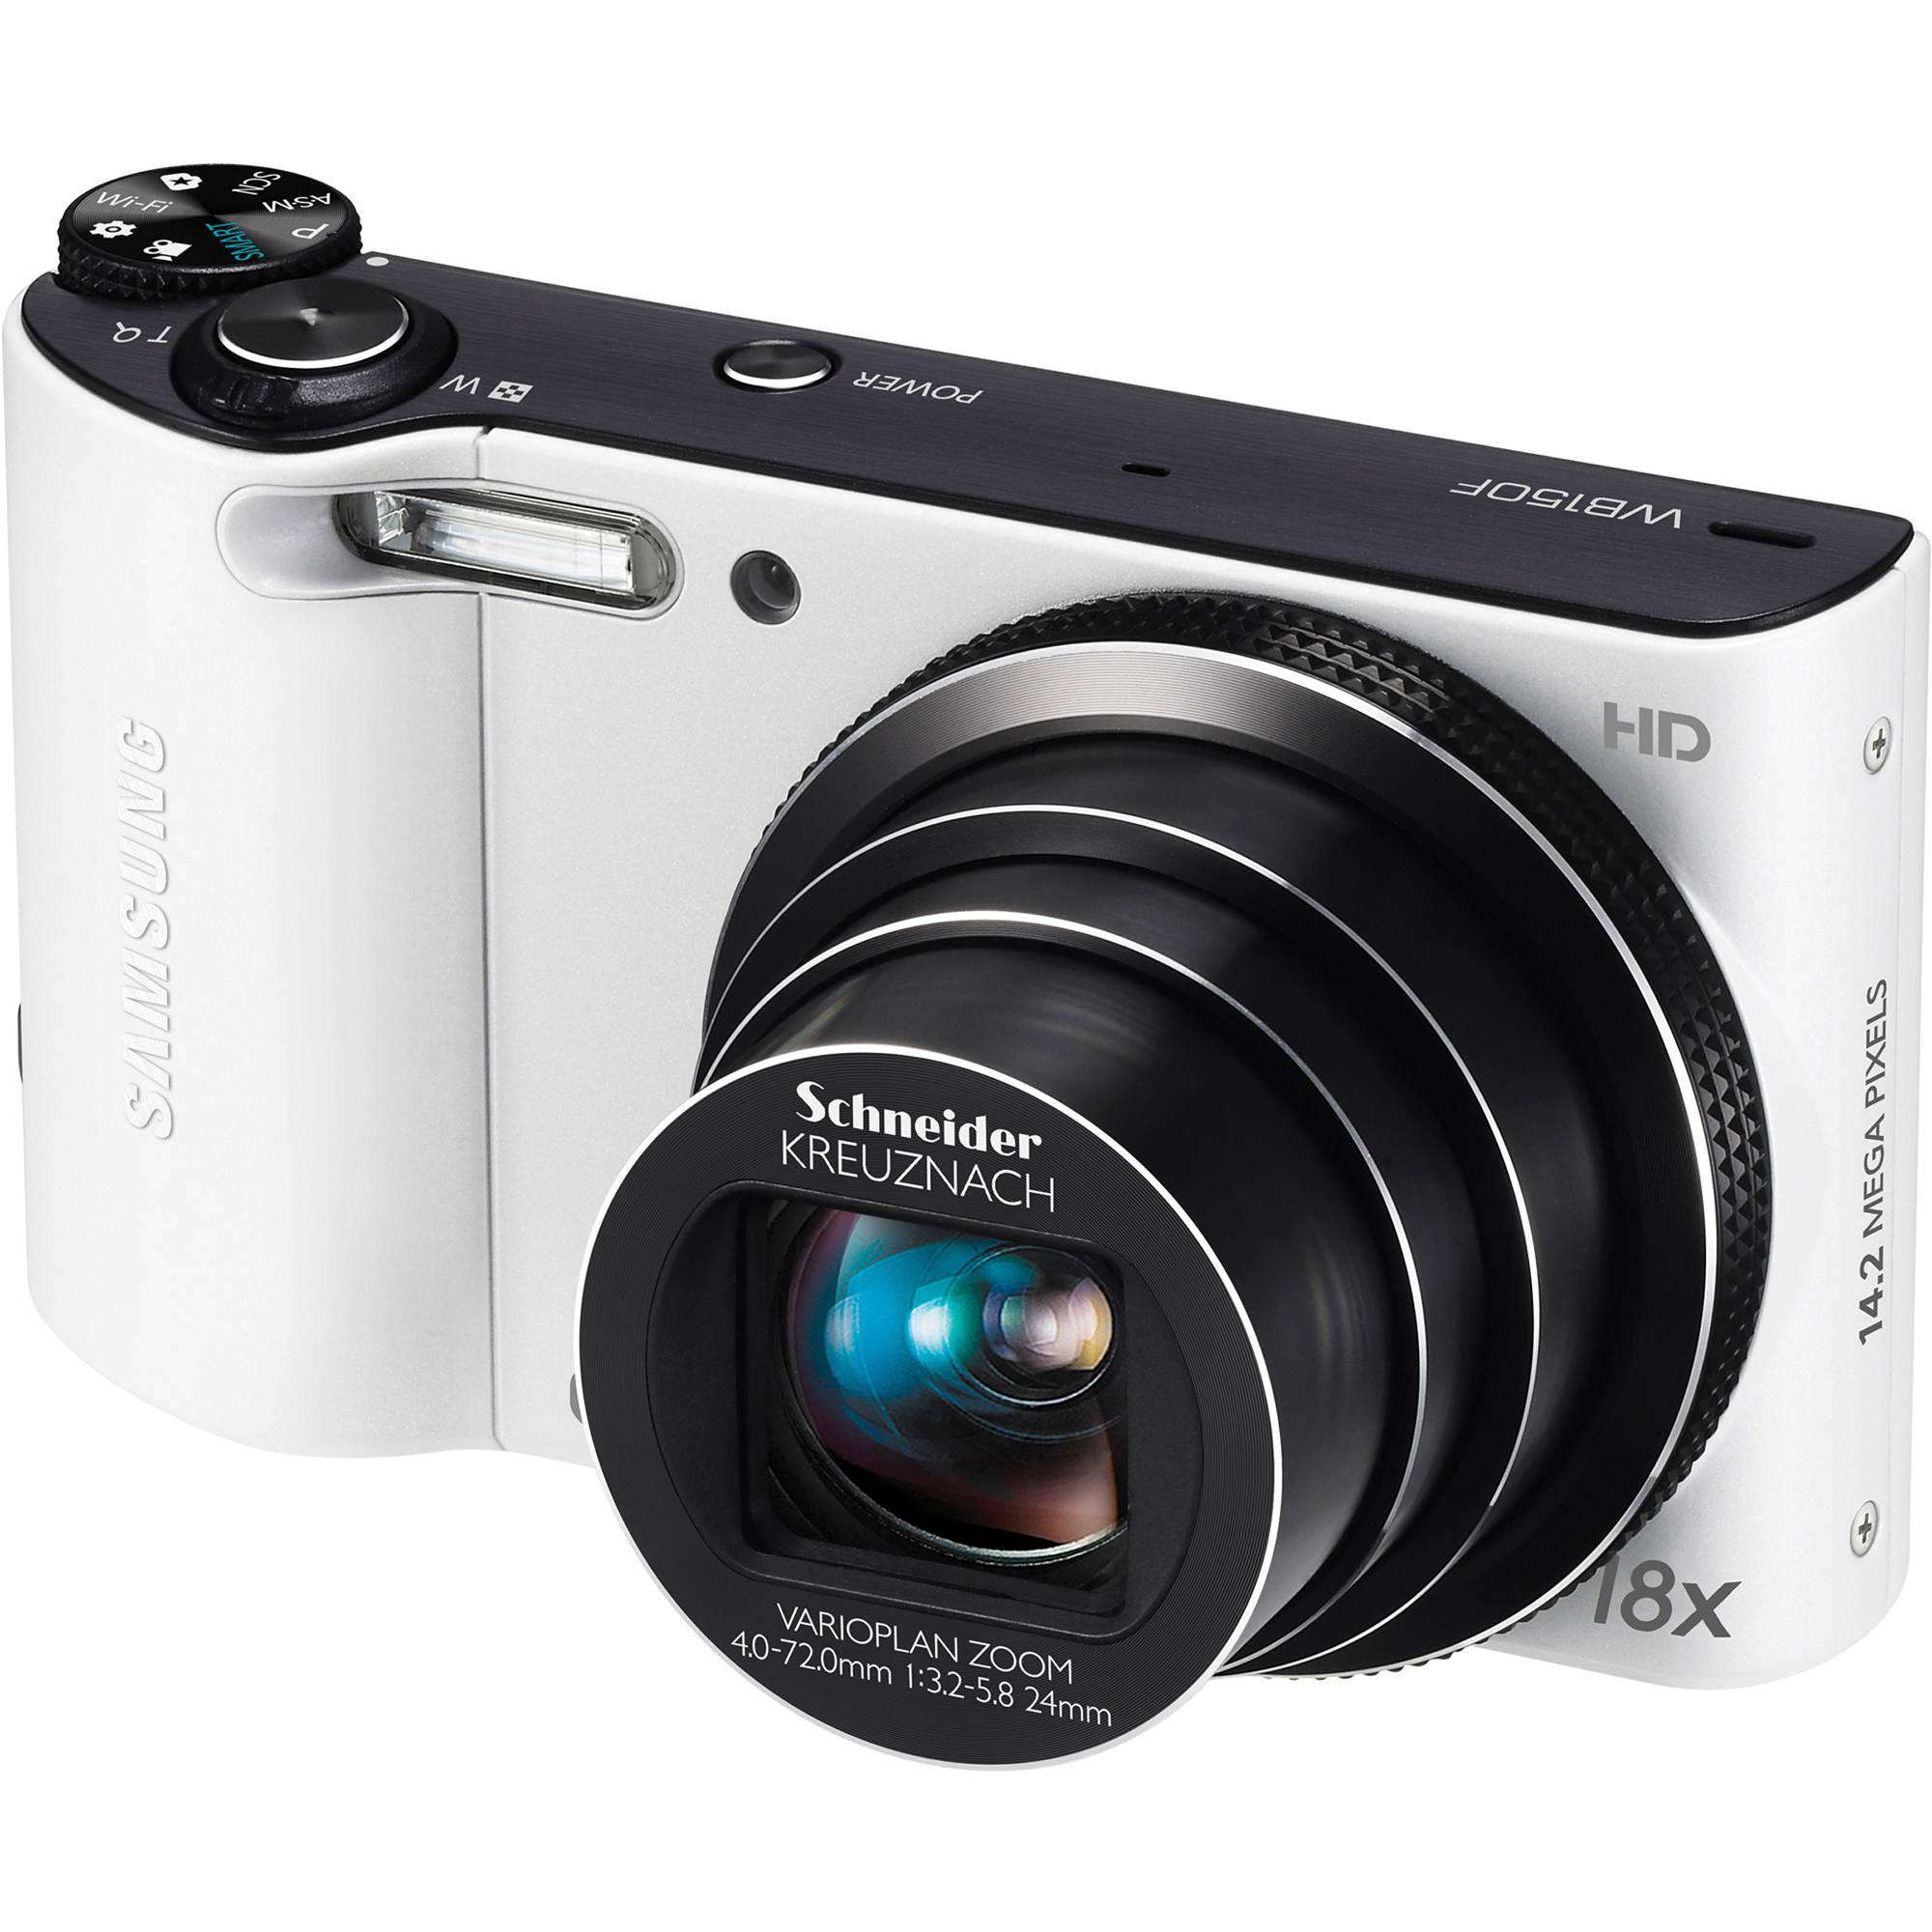 samsung wb150f smart long zoom digital camera ec